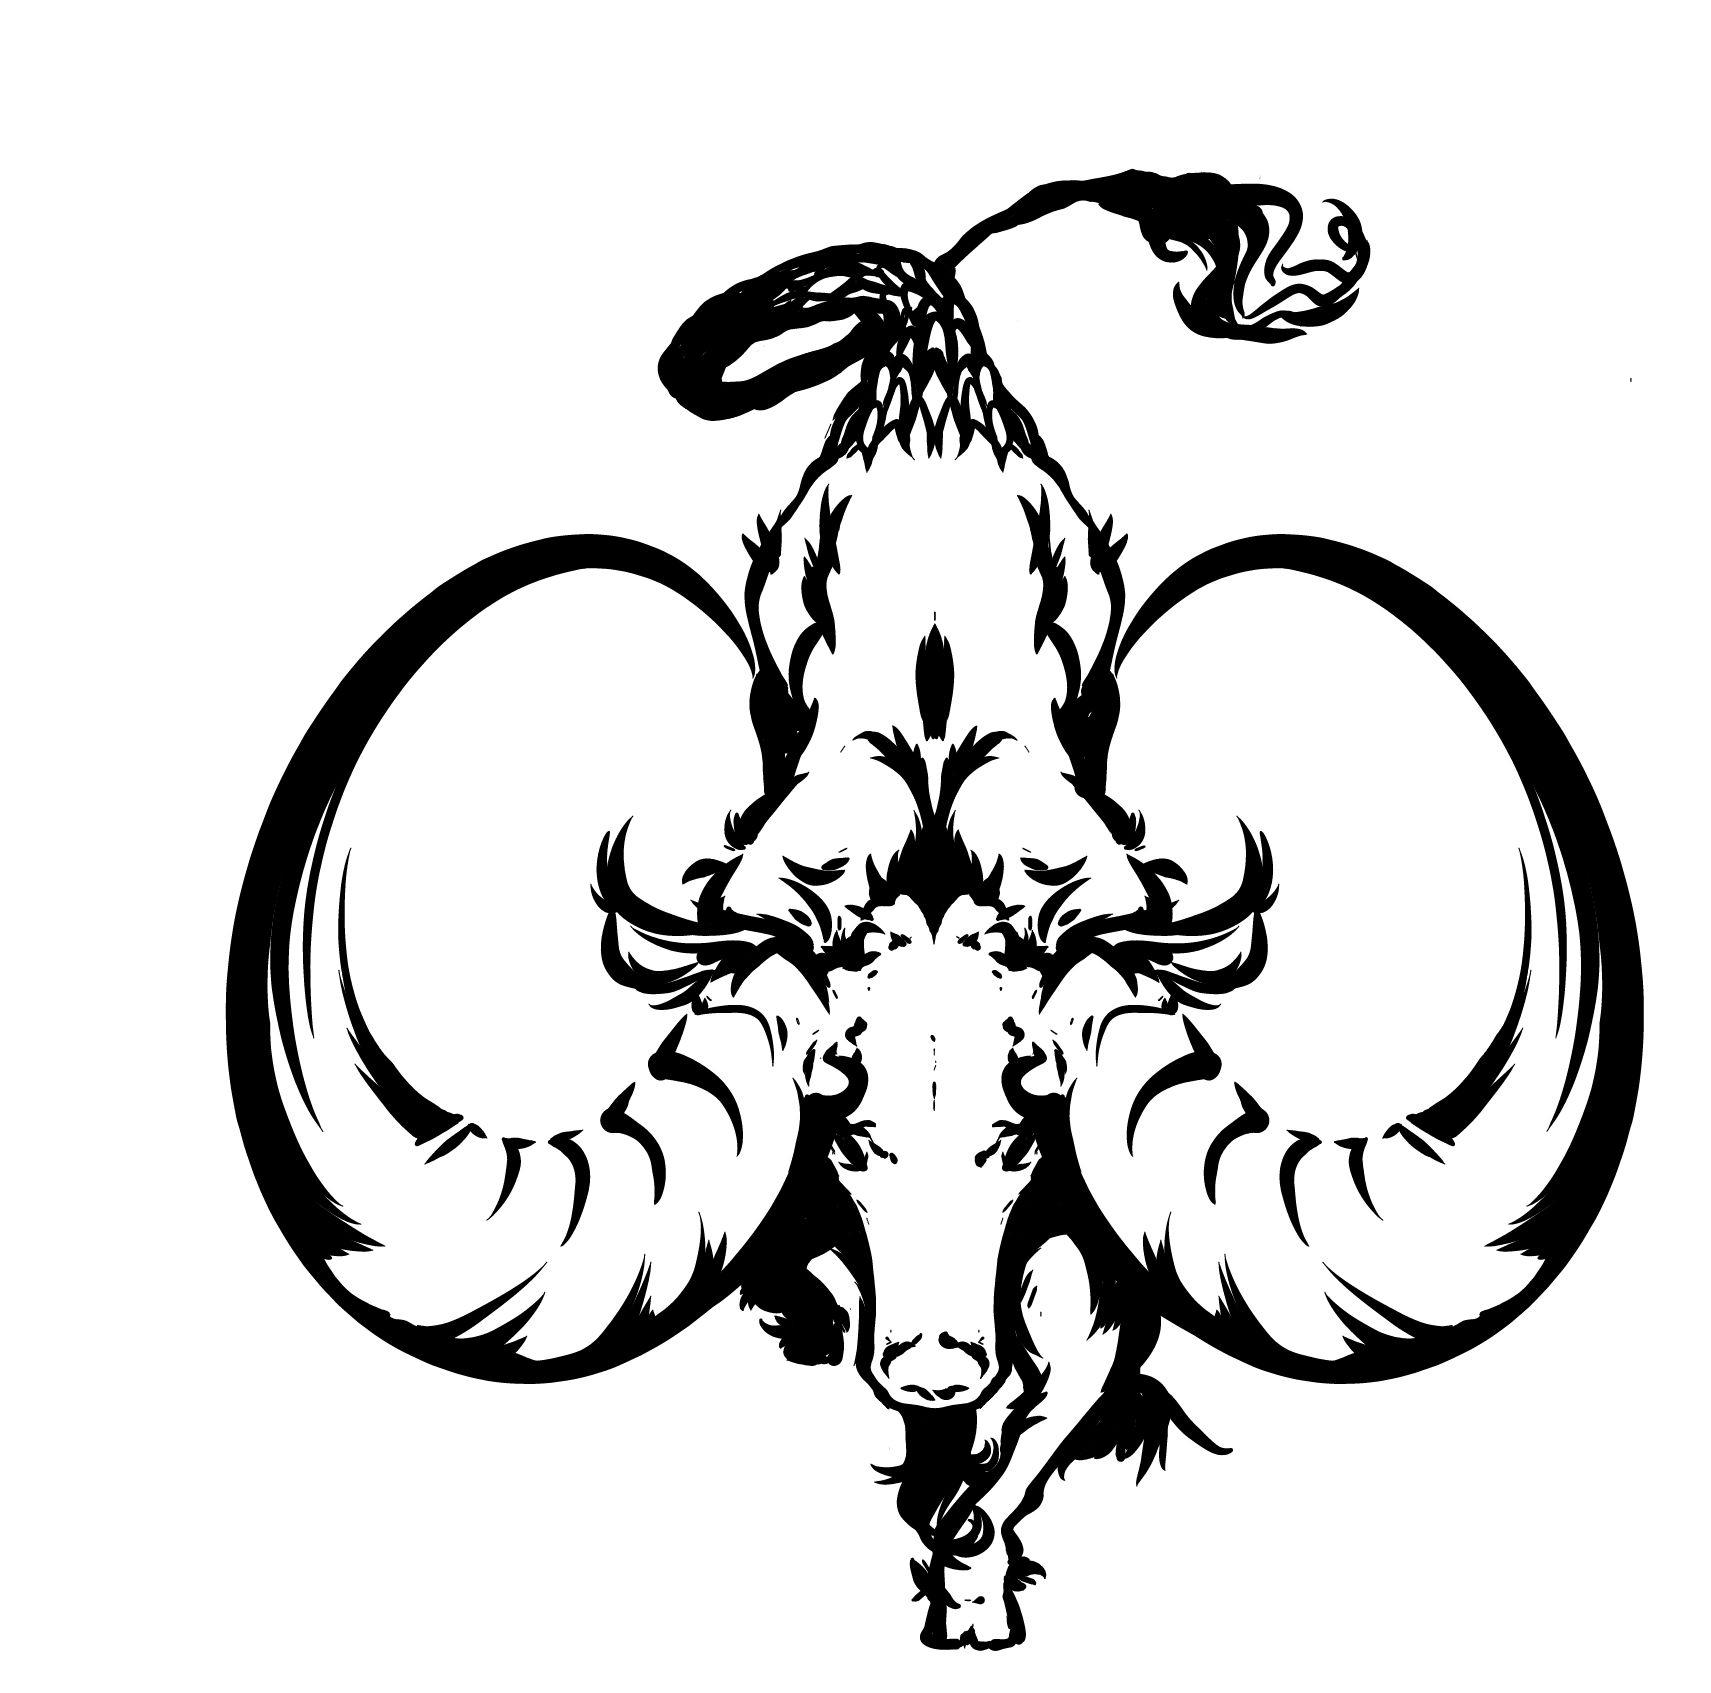 Capricorn Tattoo By Cocoaeyes On Deviantart Cap Pinterest